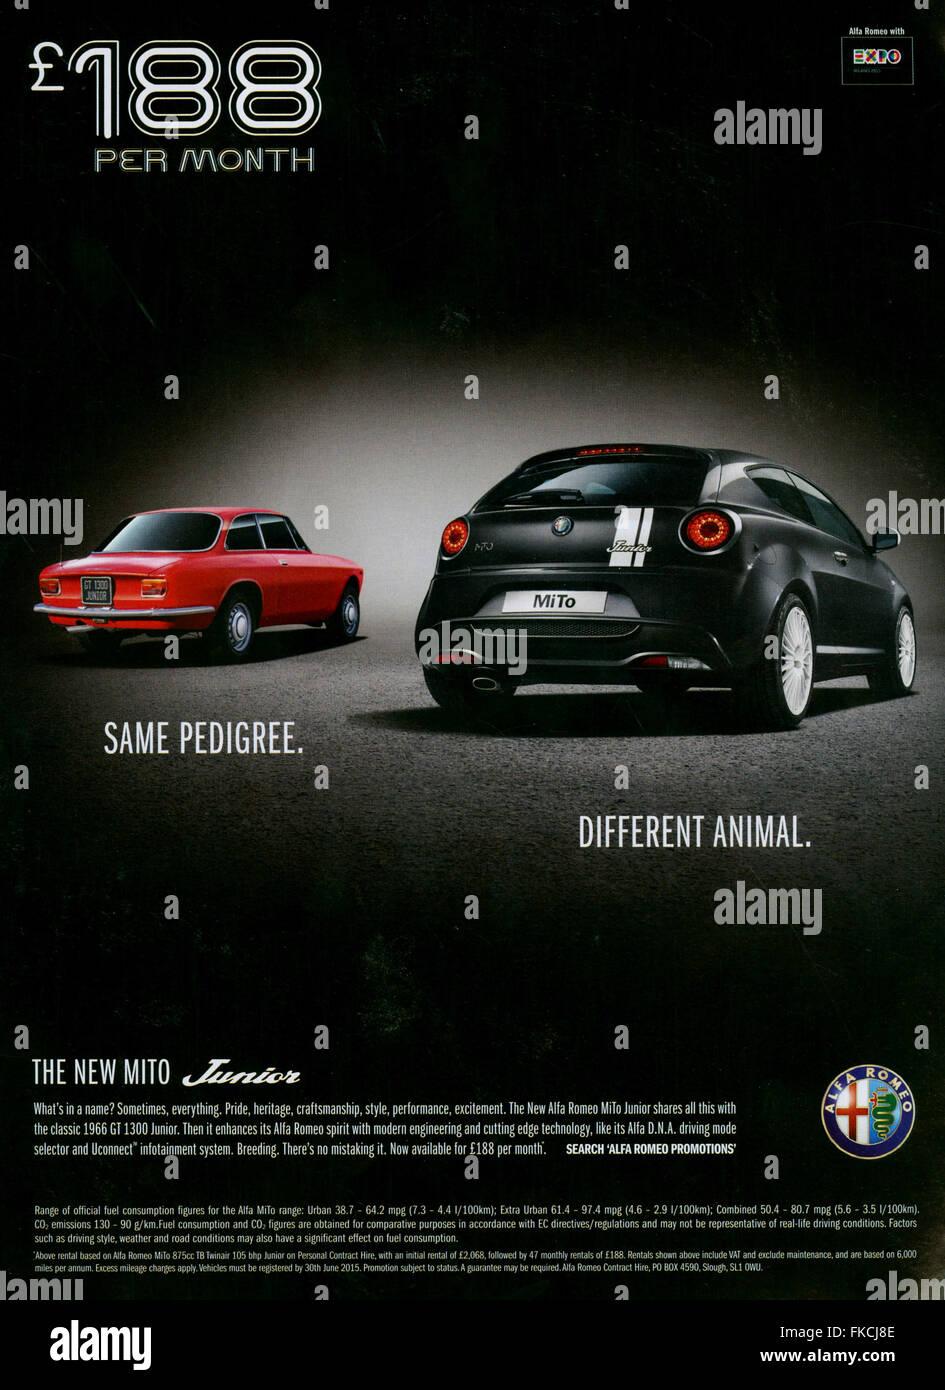 2010er Jahre UK Alfa Romeo Magazin Anzeige Stockbild